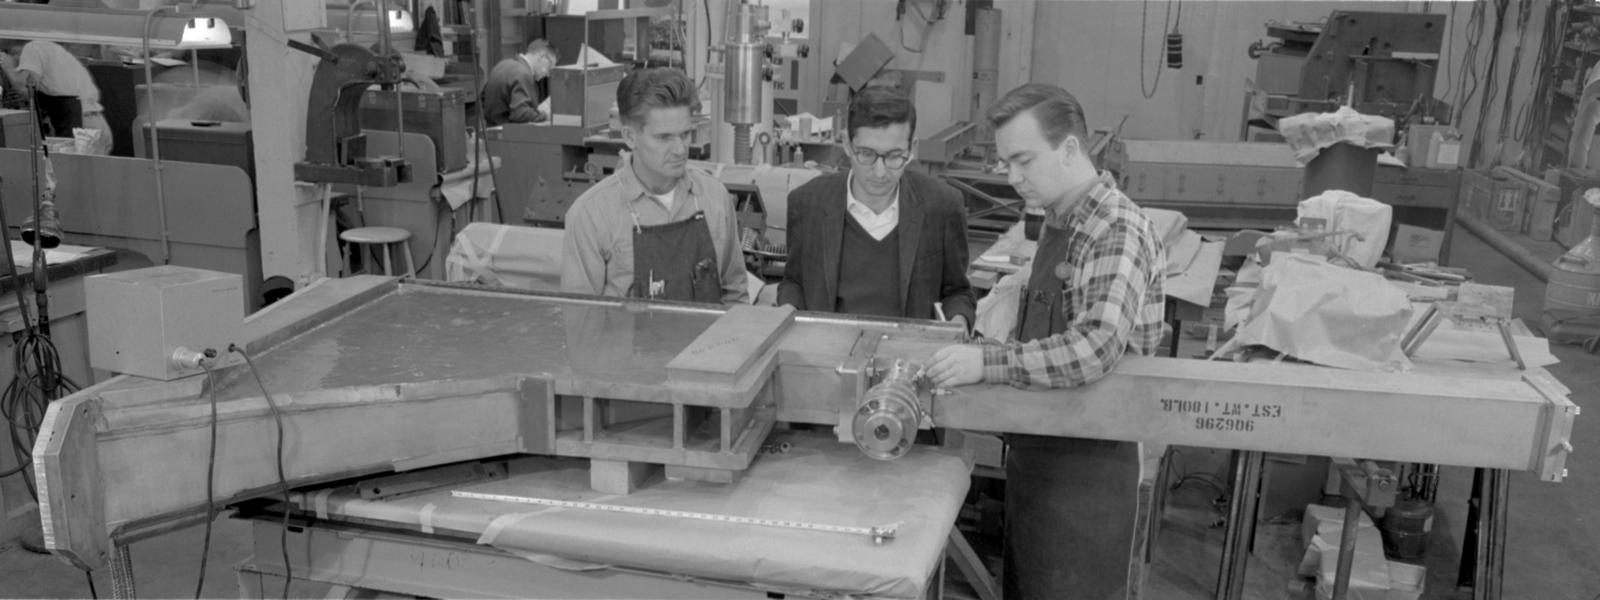 Bevatron vacuum checking extension tank, quadrant II, 89-degree area, includes Abe Glicksman, center, and Otto Draeger, right. Photograph taken December 5, 1962. Bevatron-3149 – Photographer: Doug Bradley